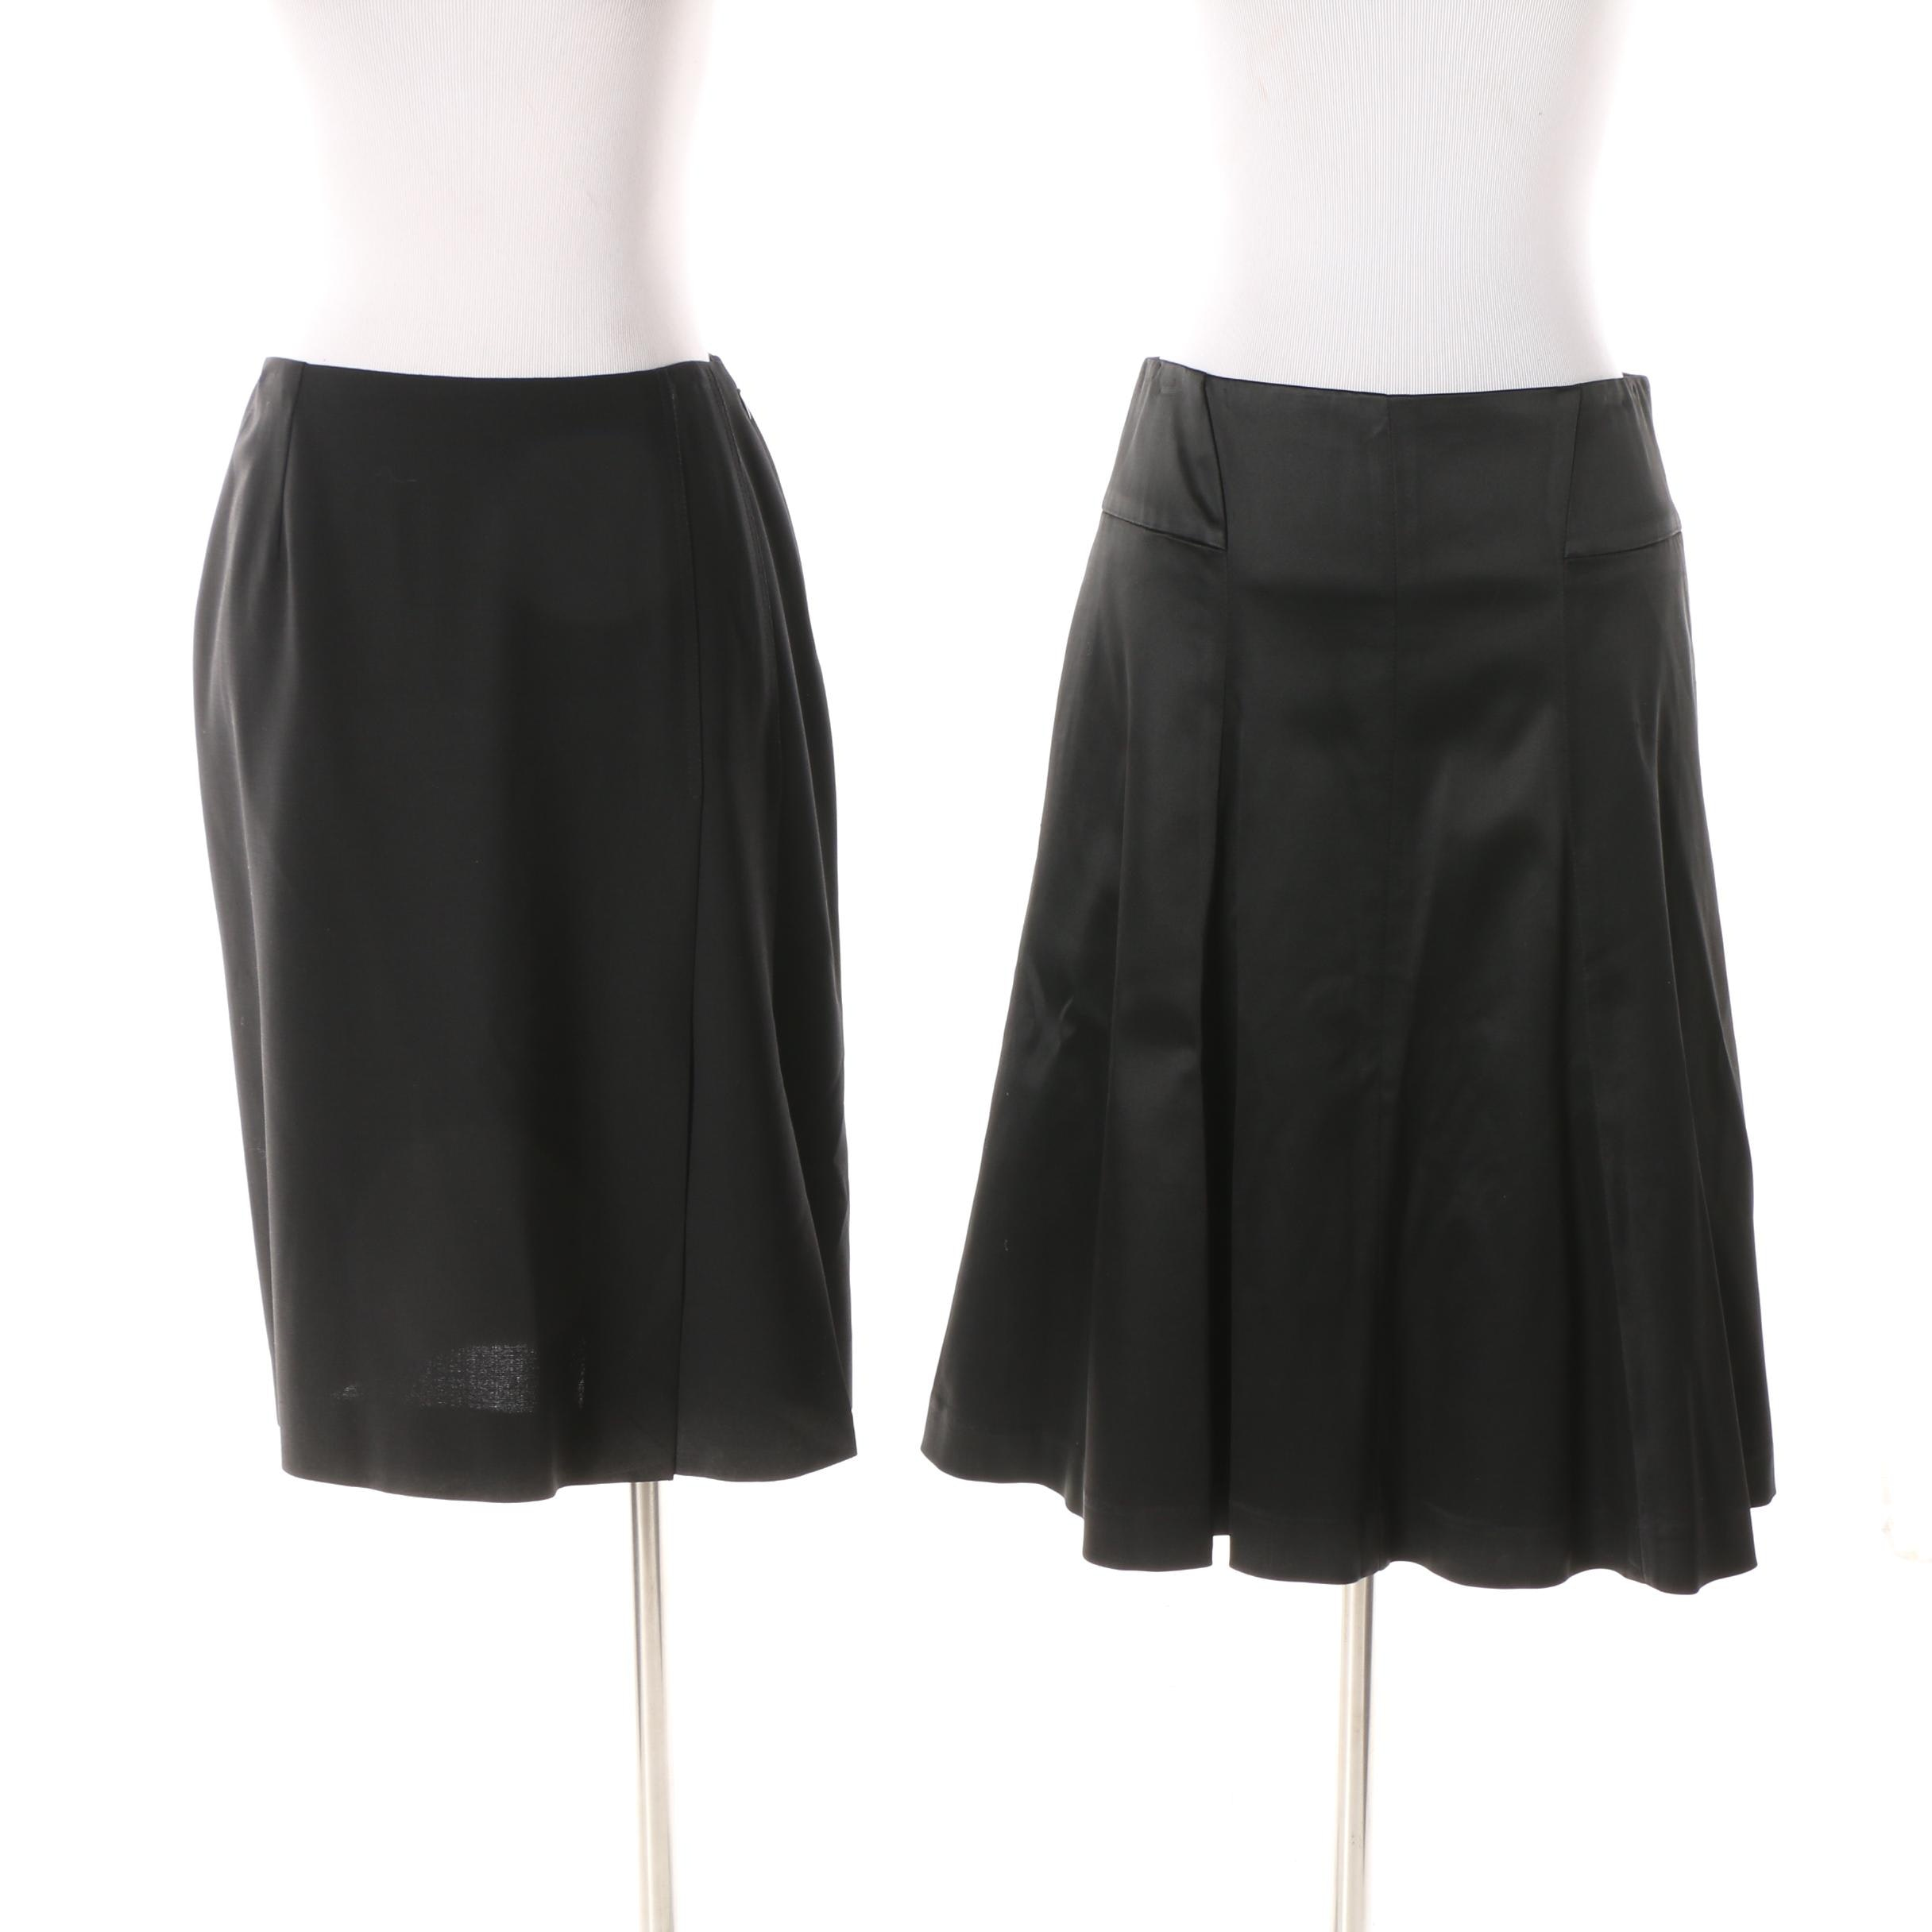 Dolce & Gabbana Black Pencil Skirt and Theory Black A-Line Skirt